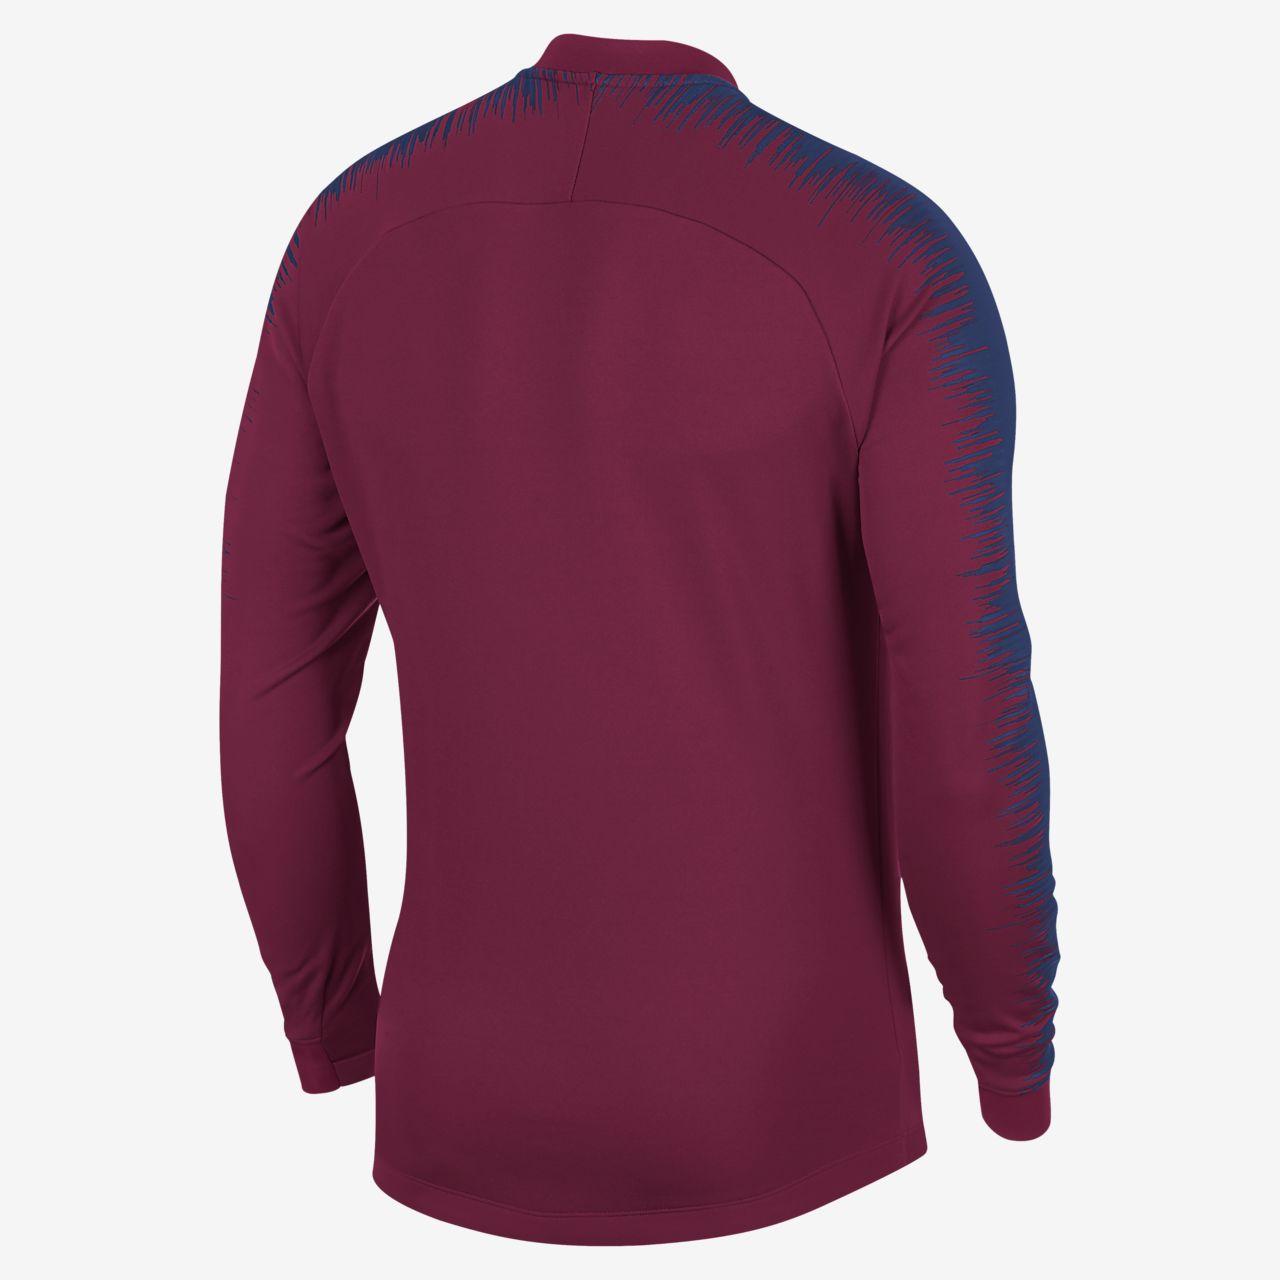 7719df0fc FC Barcelona Anthem Men's Football Jacket. Nike.com AU